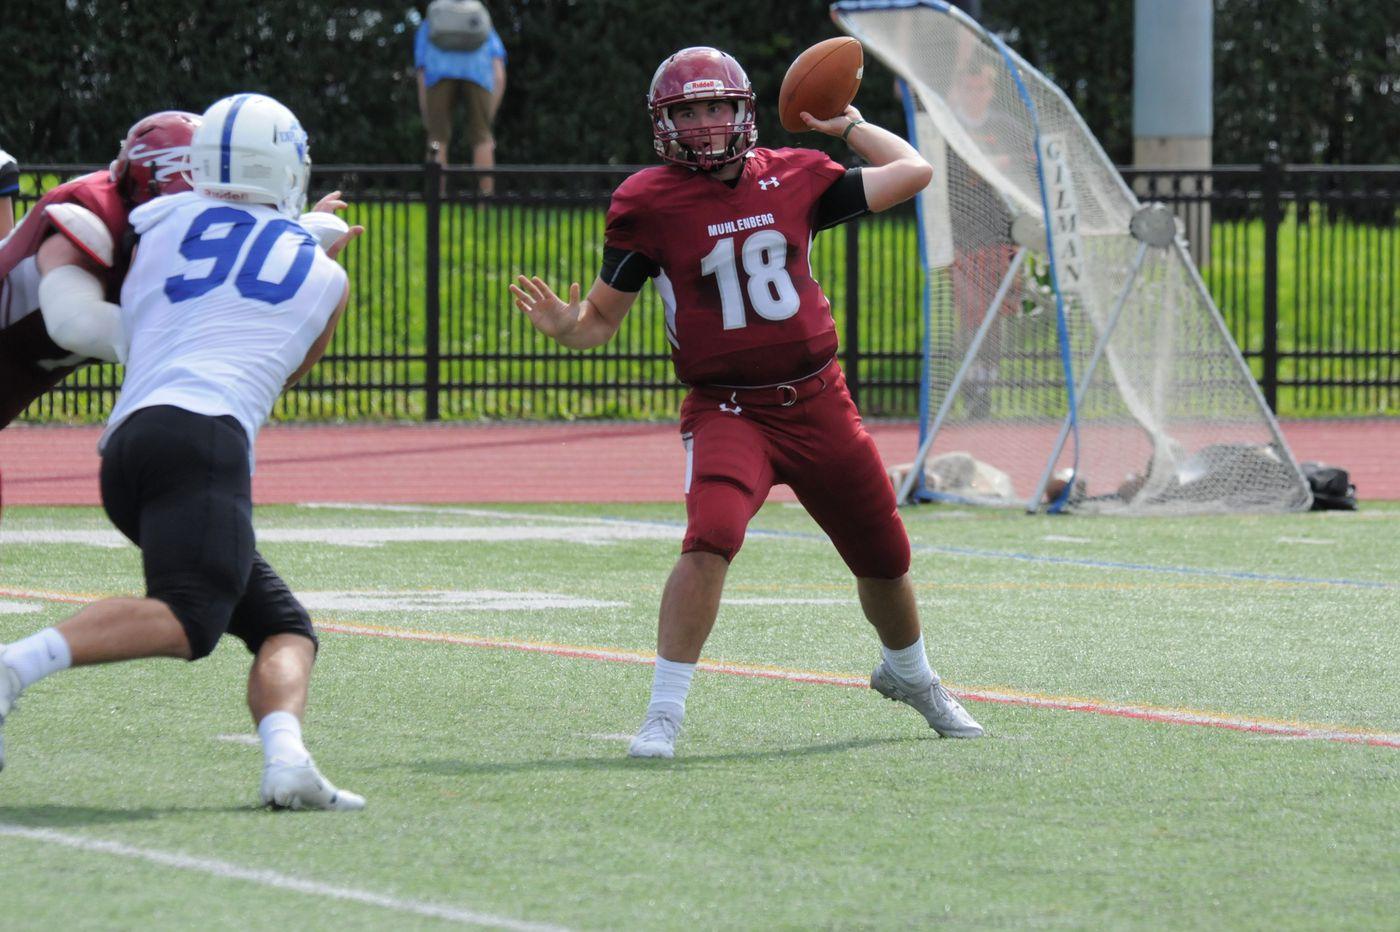 Penn Charter grads fueling Muhlenberg's run to Division III quarterfinals